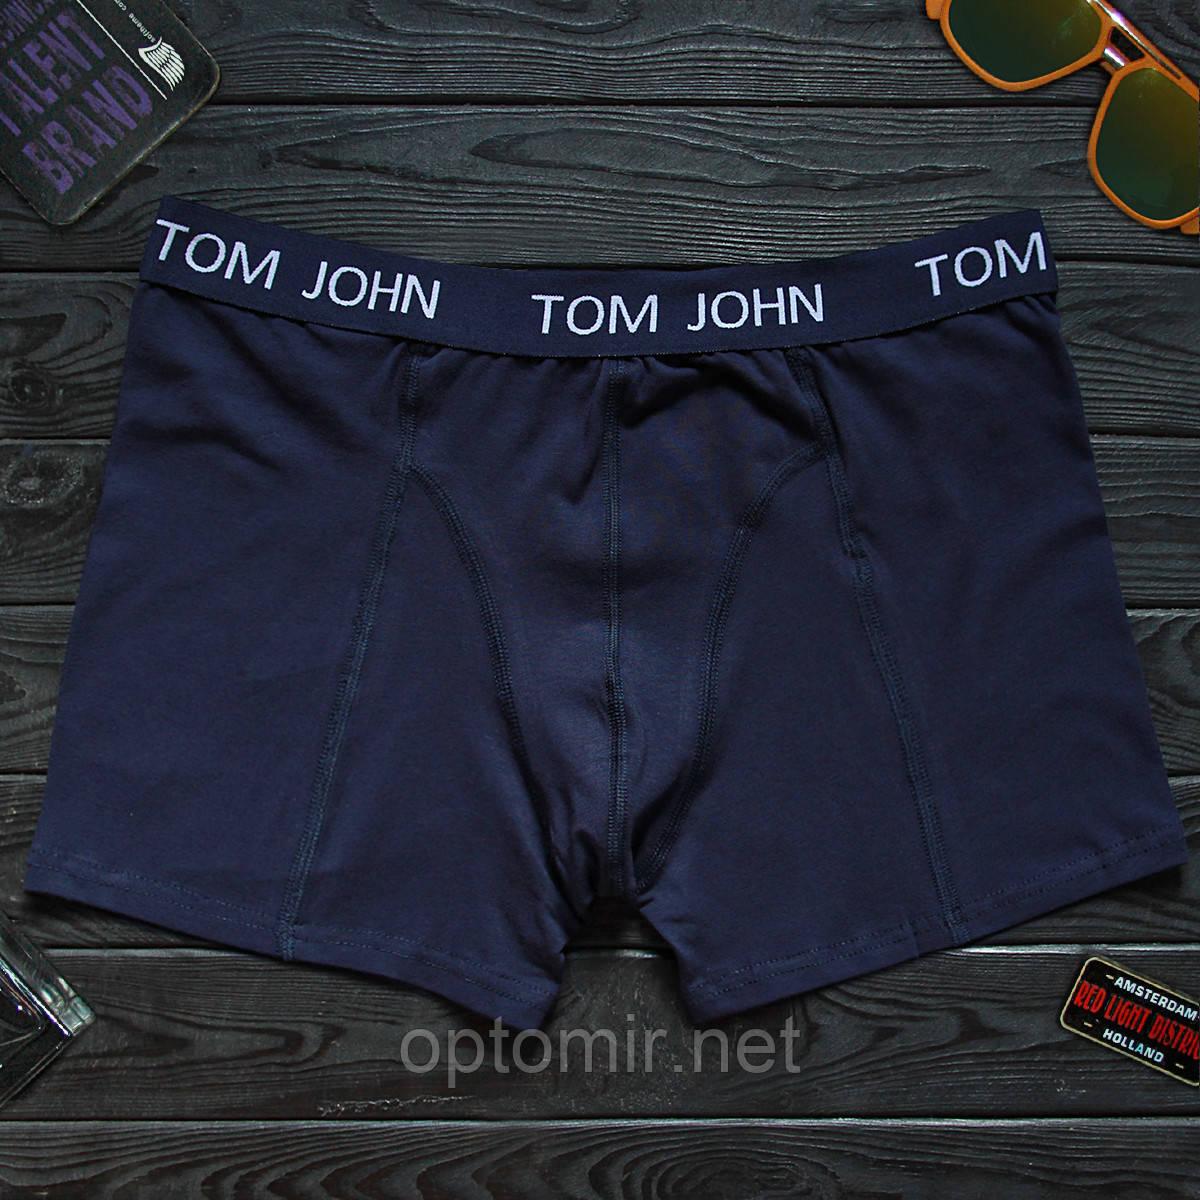 Трусы мужские боксеры Tom John Турция M | 1 шт.